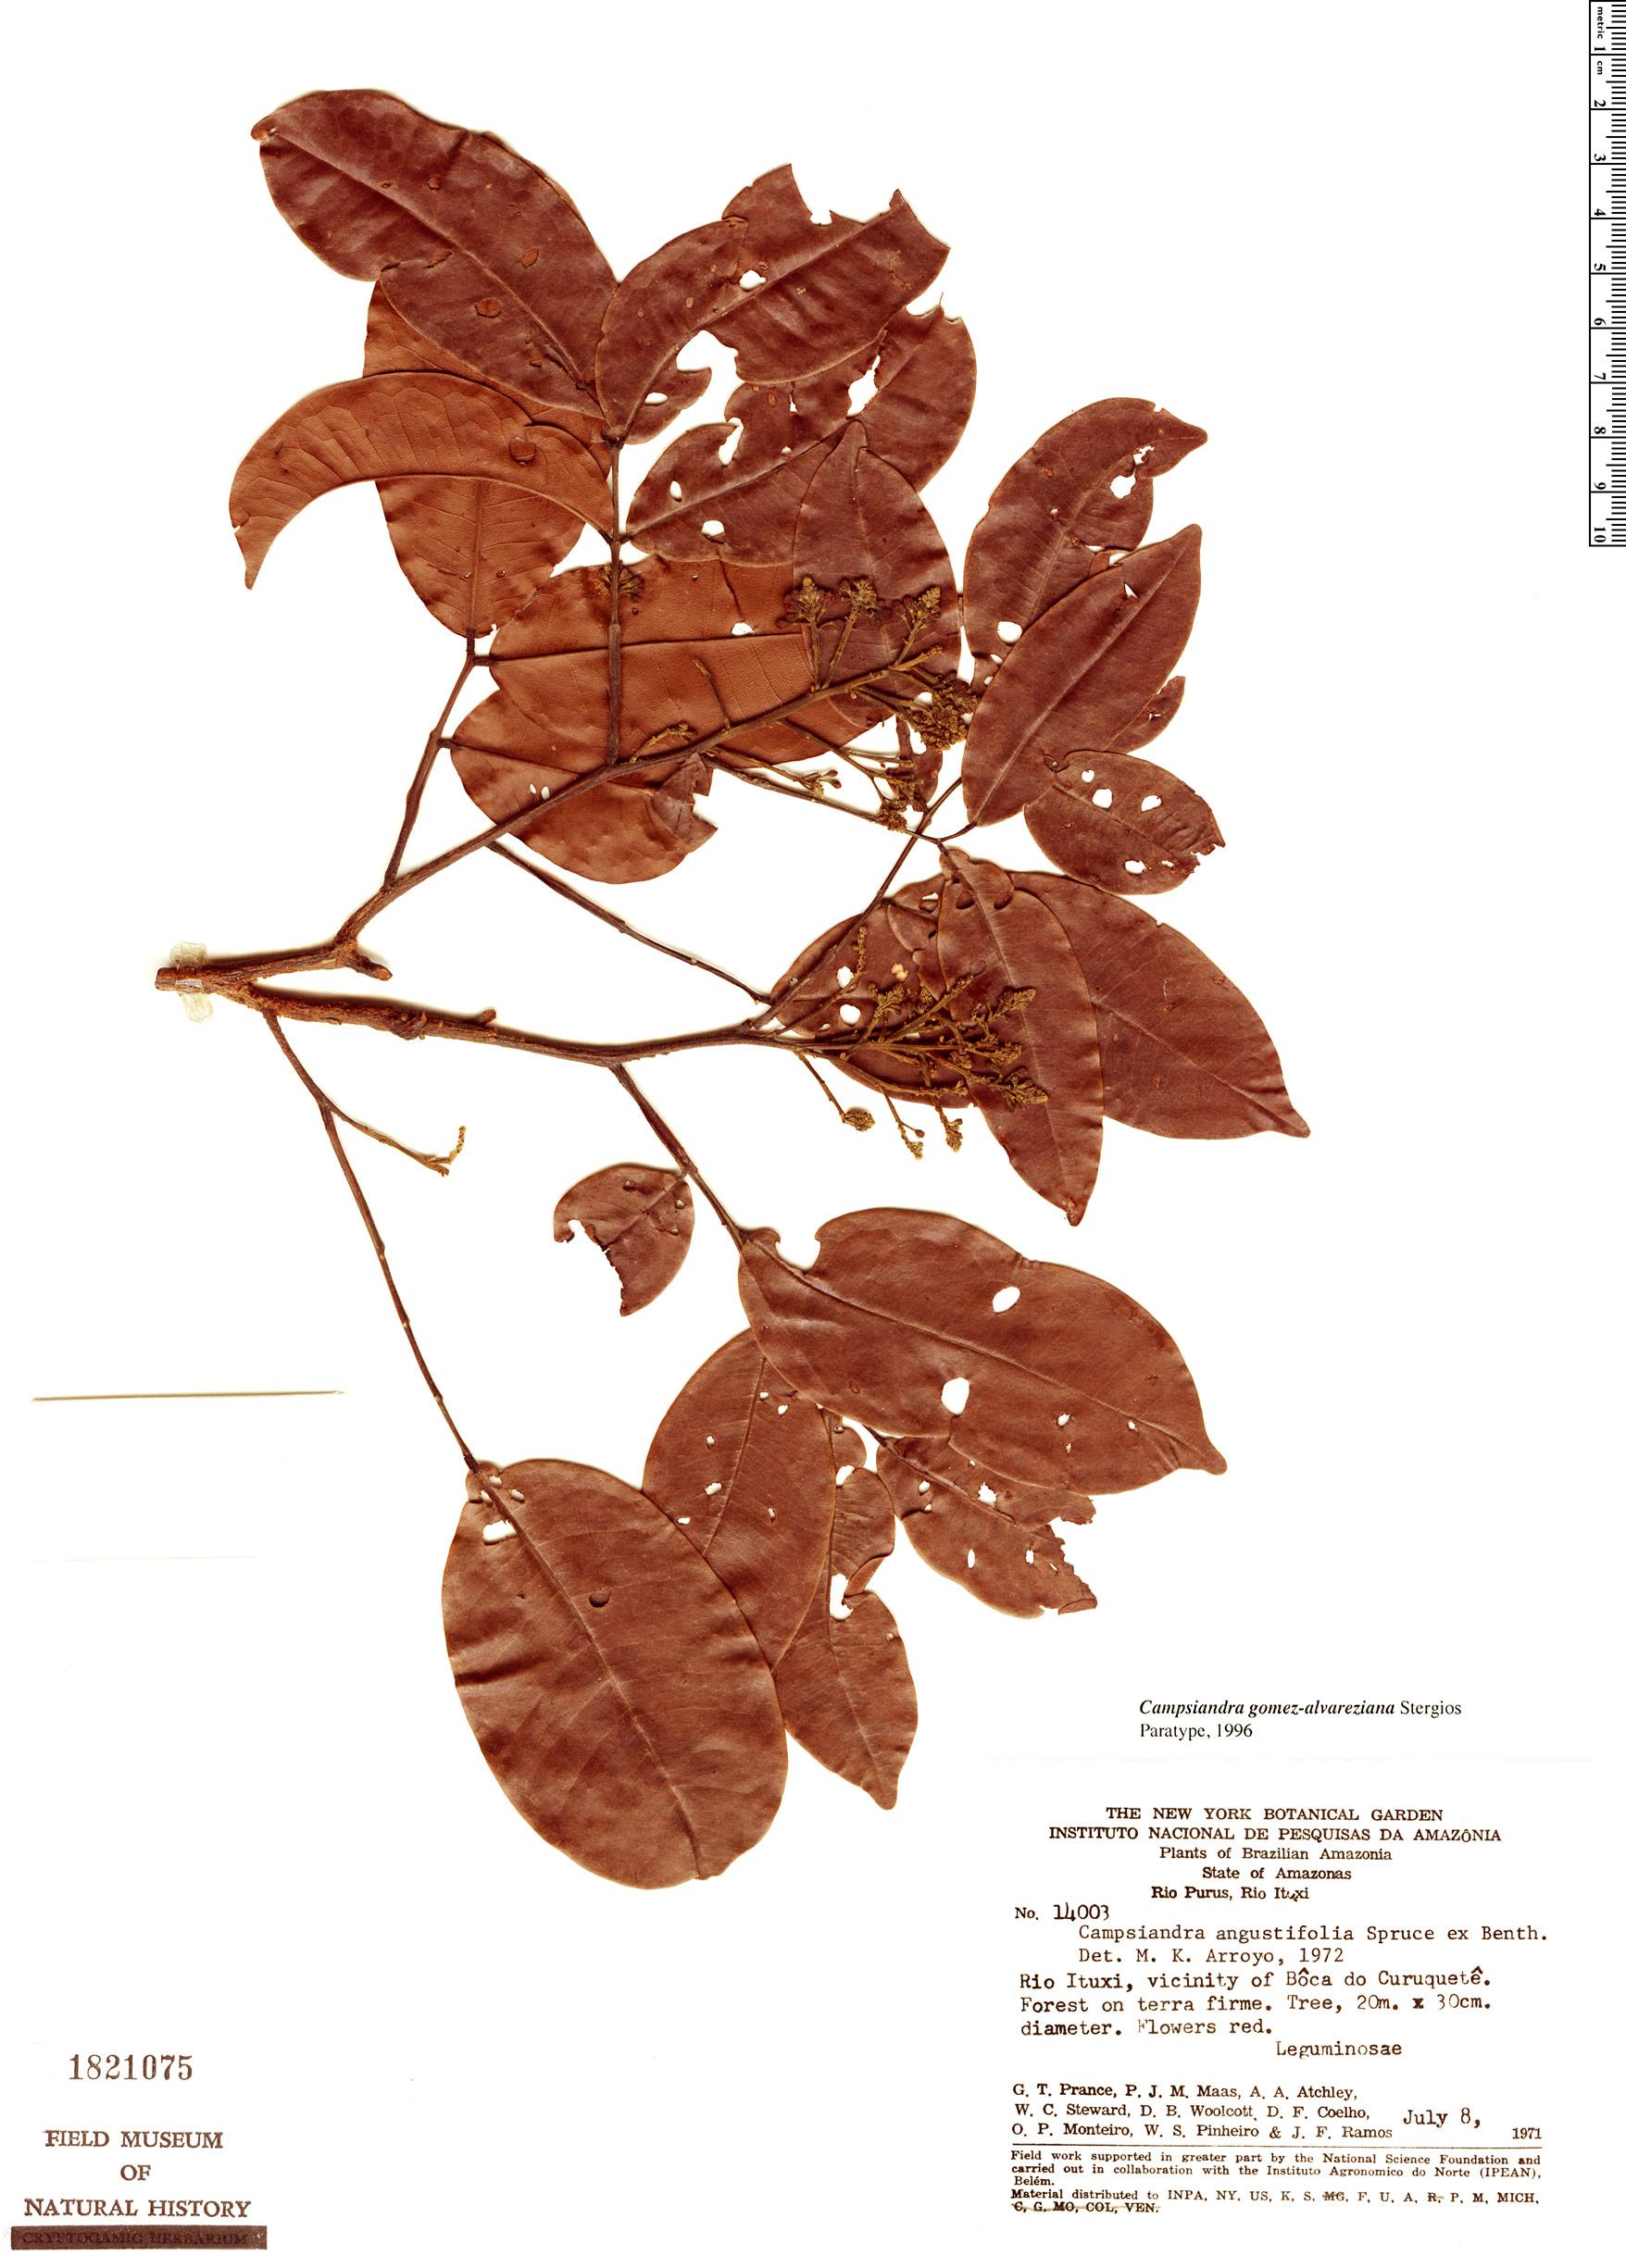 Specimen: Campsiandra gomez-alvareziana